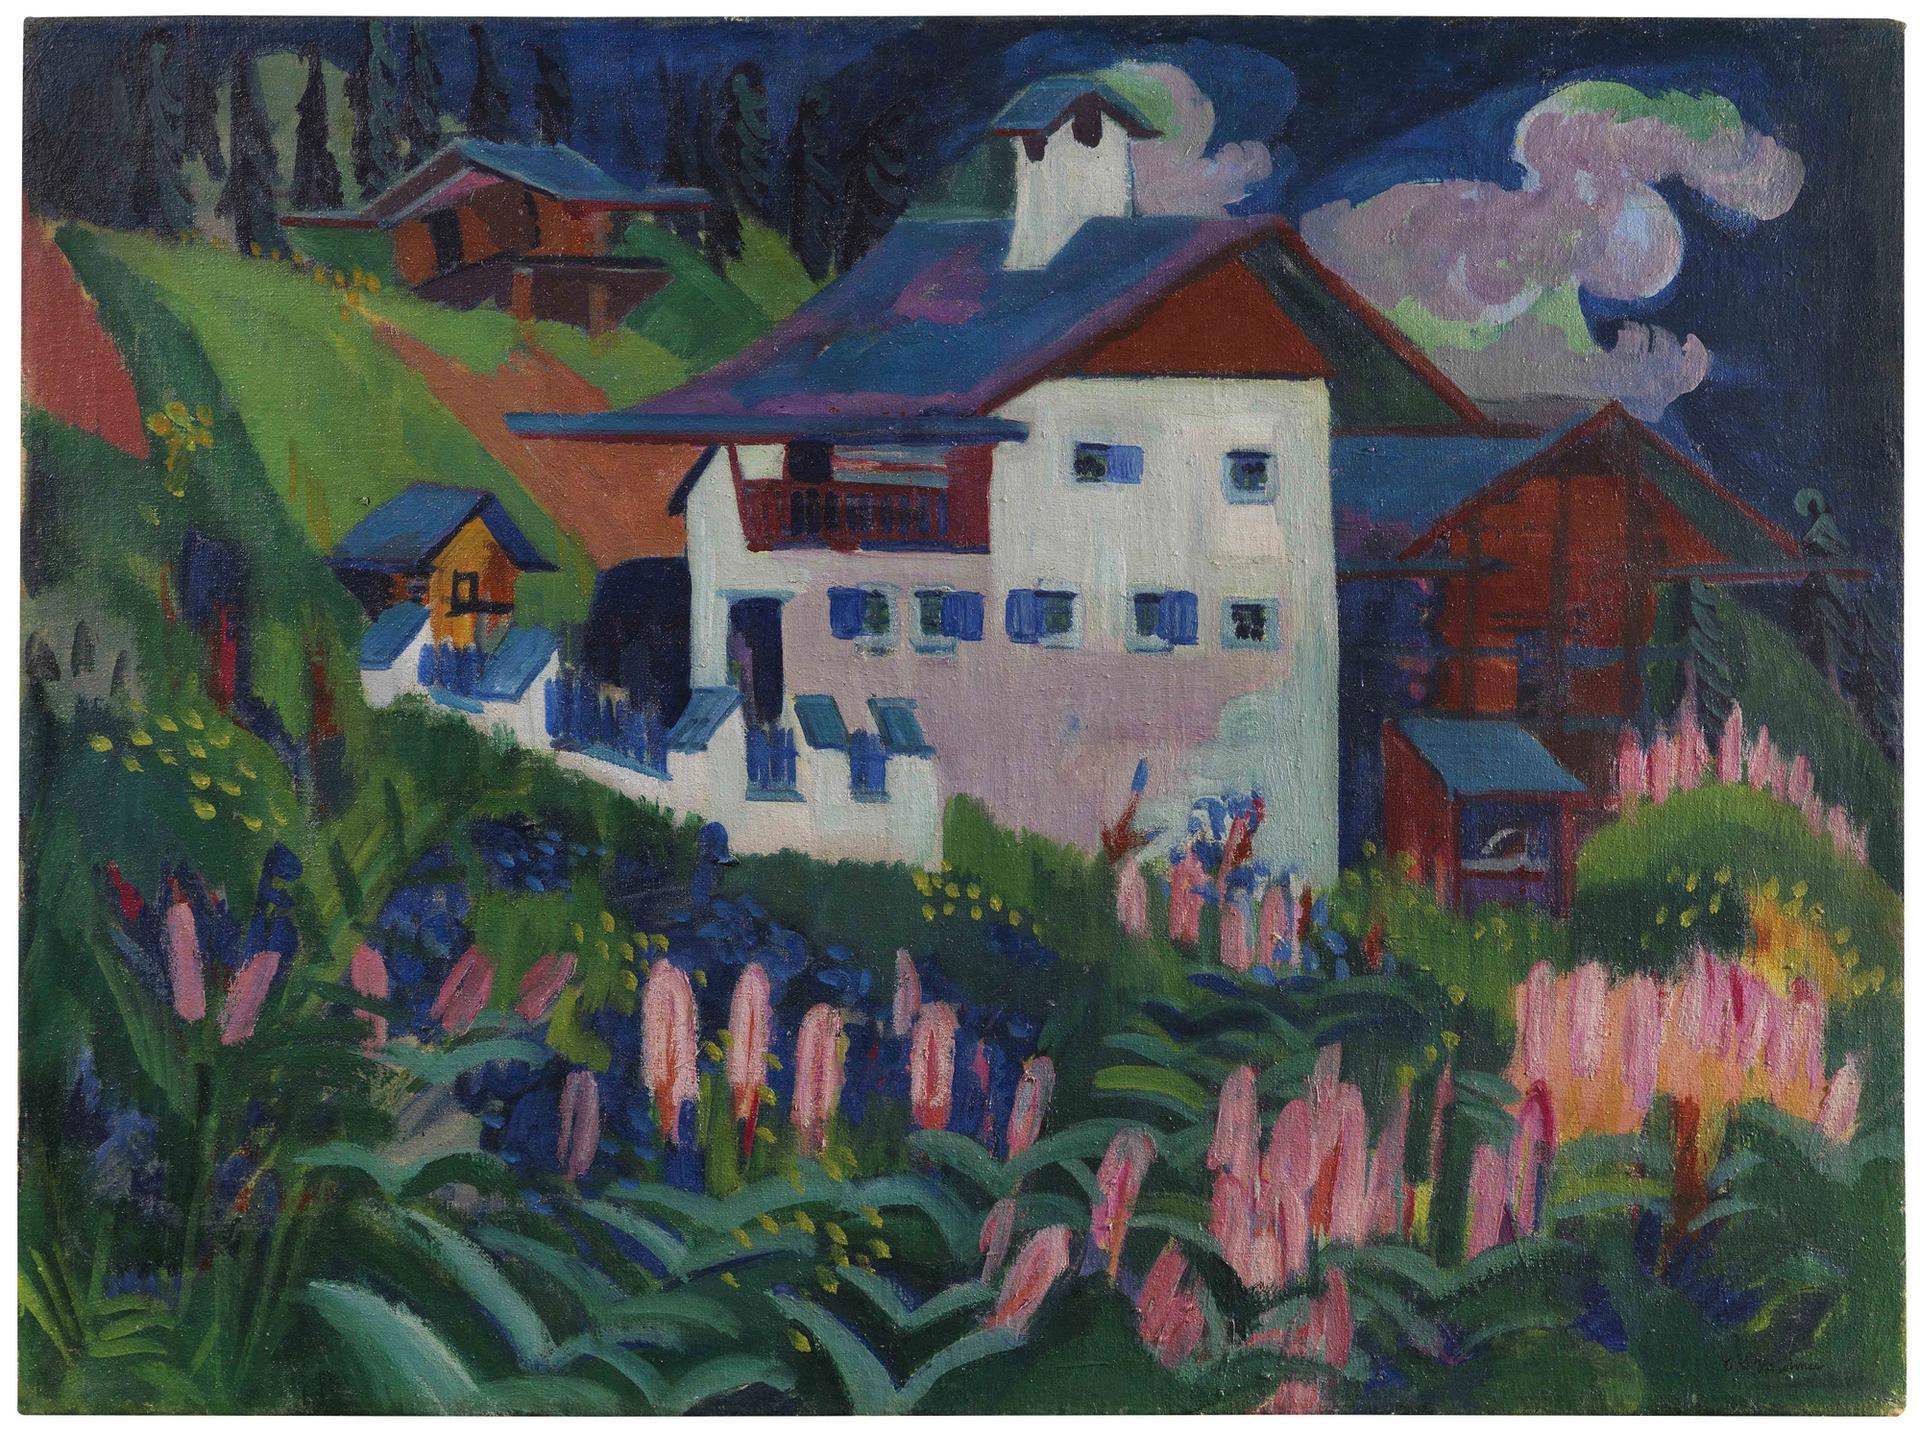 Ernst Ludwig Kirchner's Our House, sold for €1.7m Courtesy of Ketterer Kunst